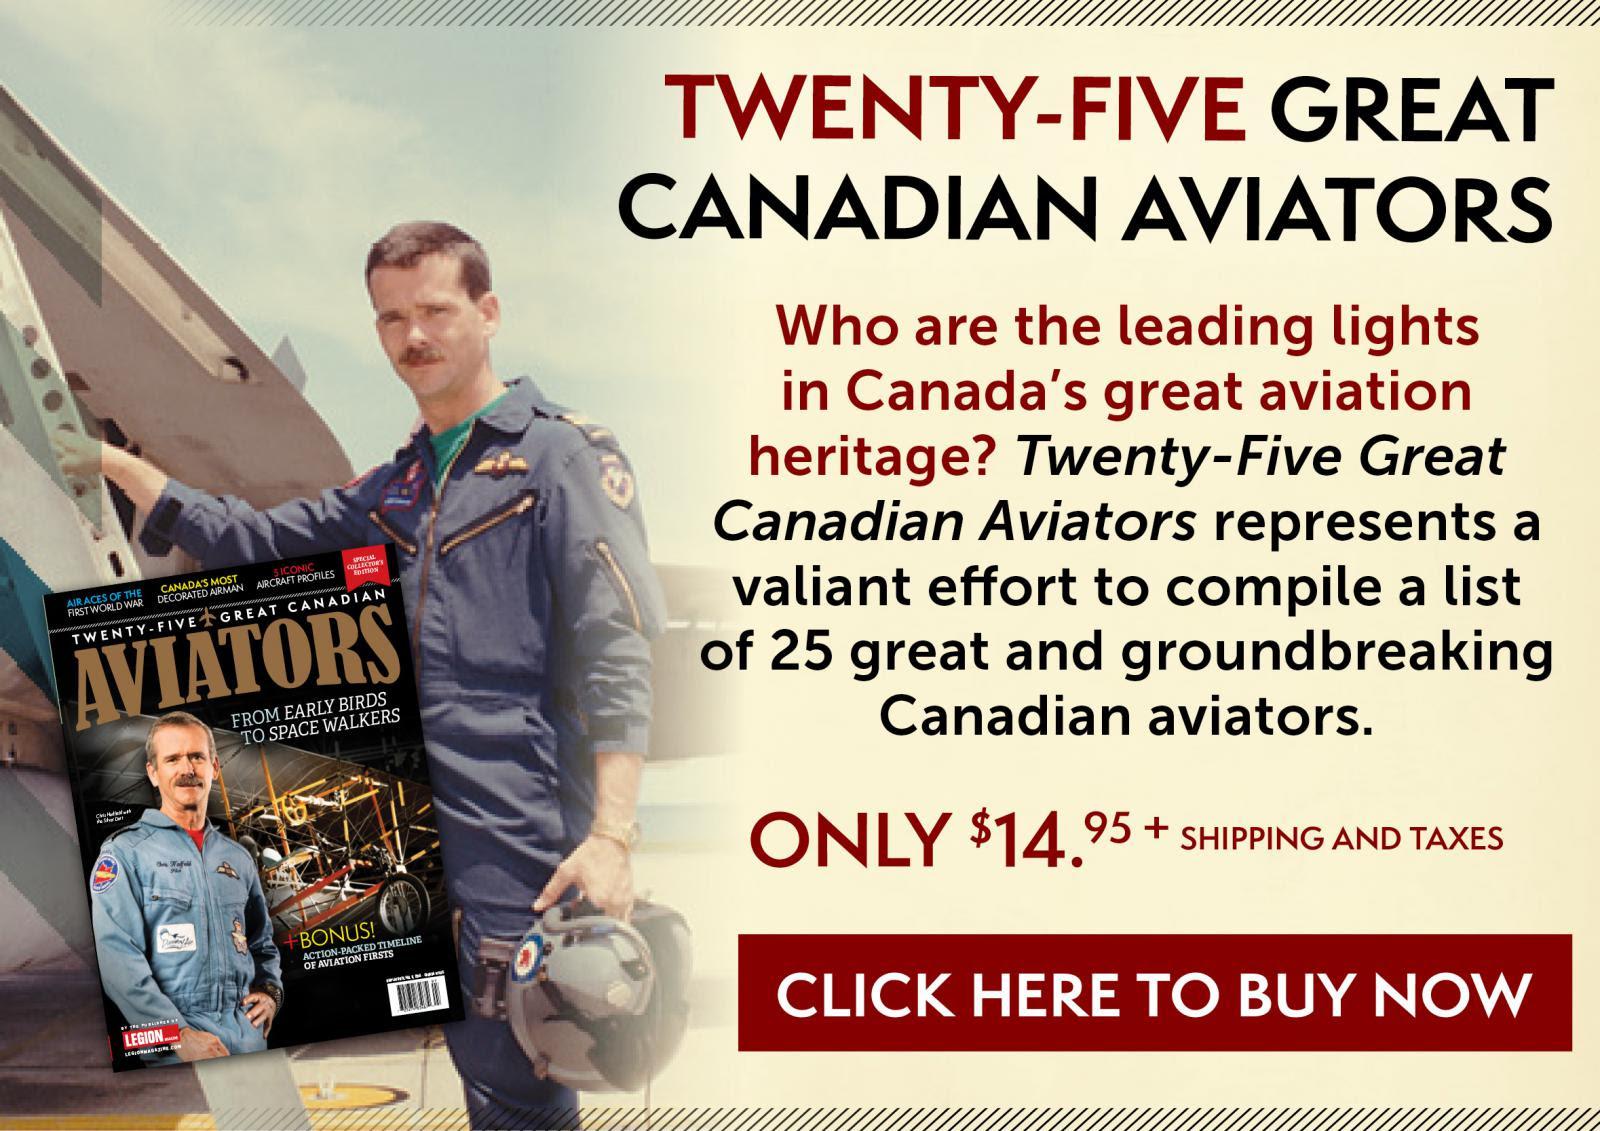 Twenty-Five Great Canadian Aviators